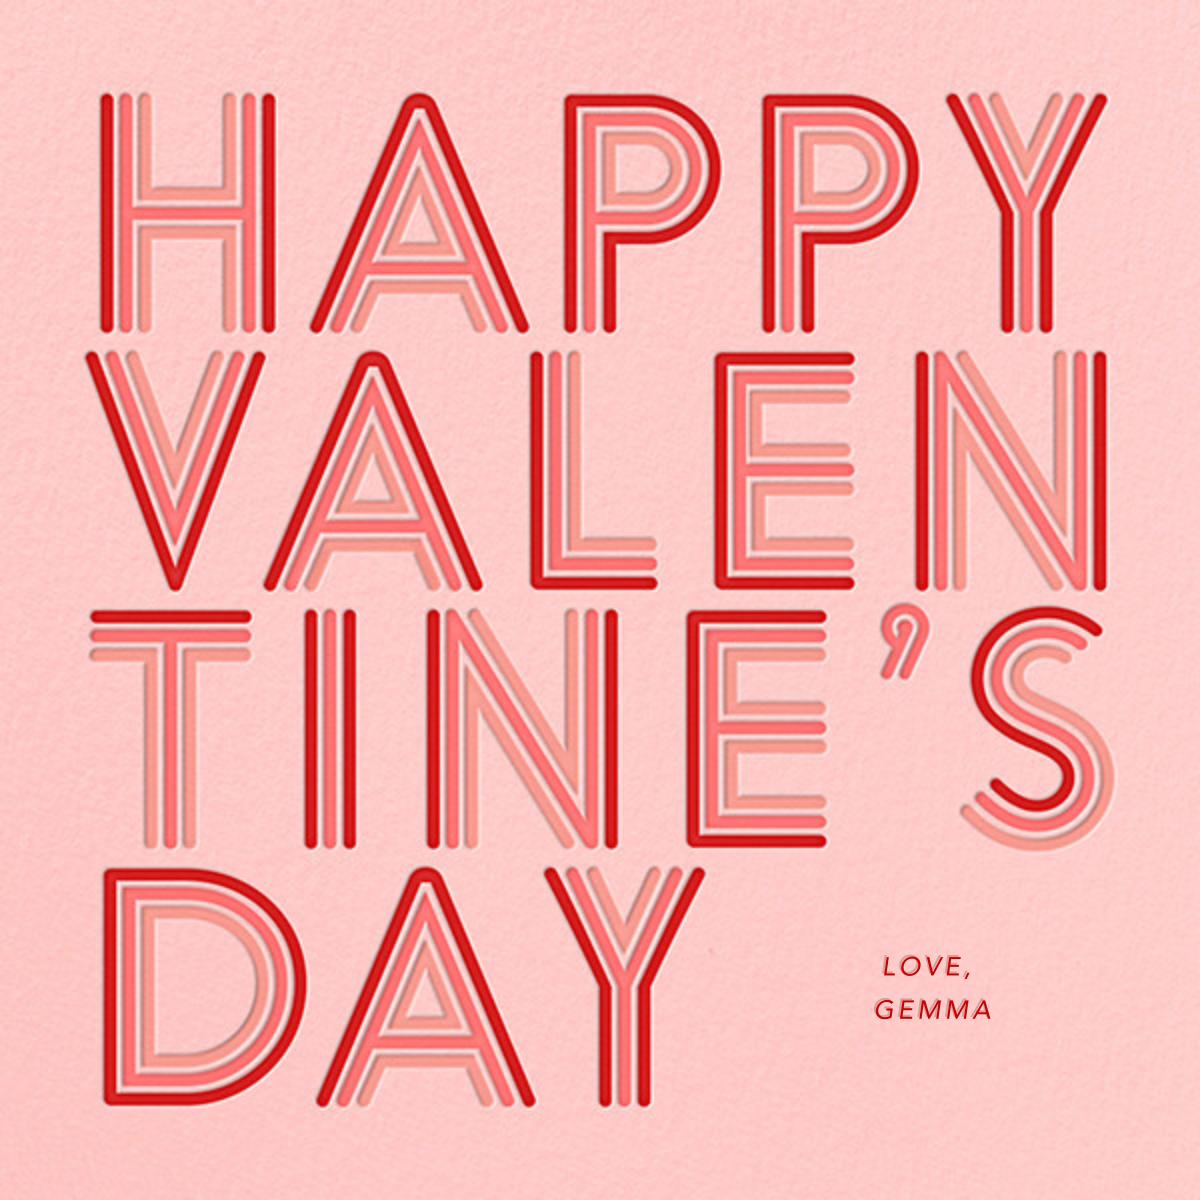 70s Love - Paperless Post - Valentine's Day